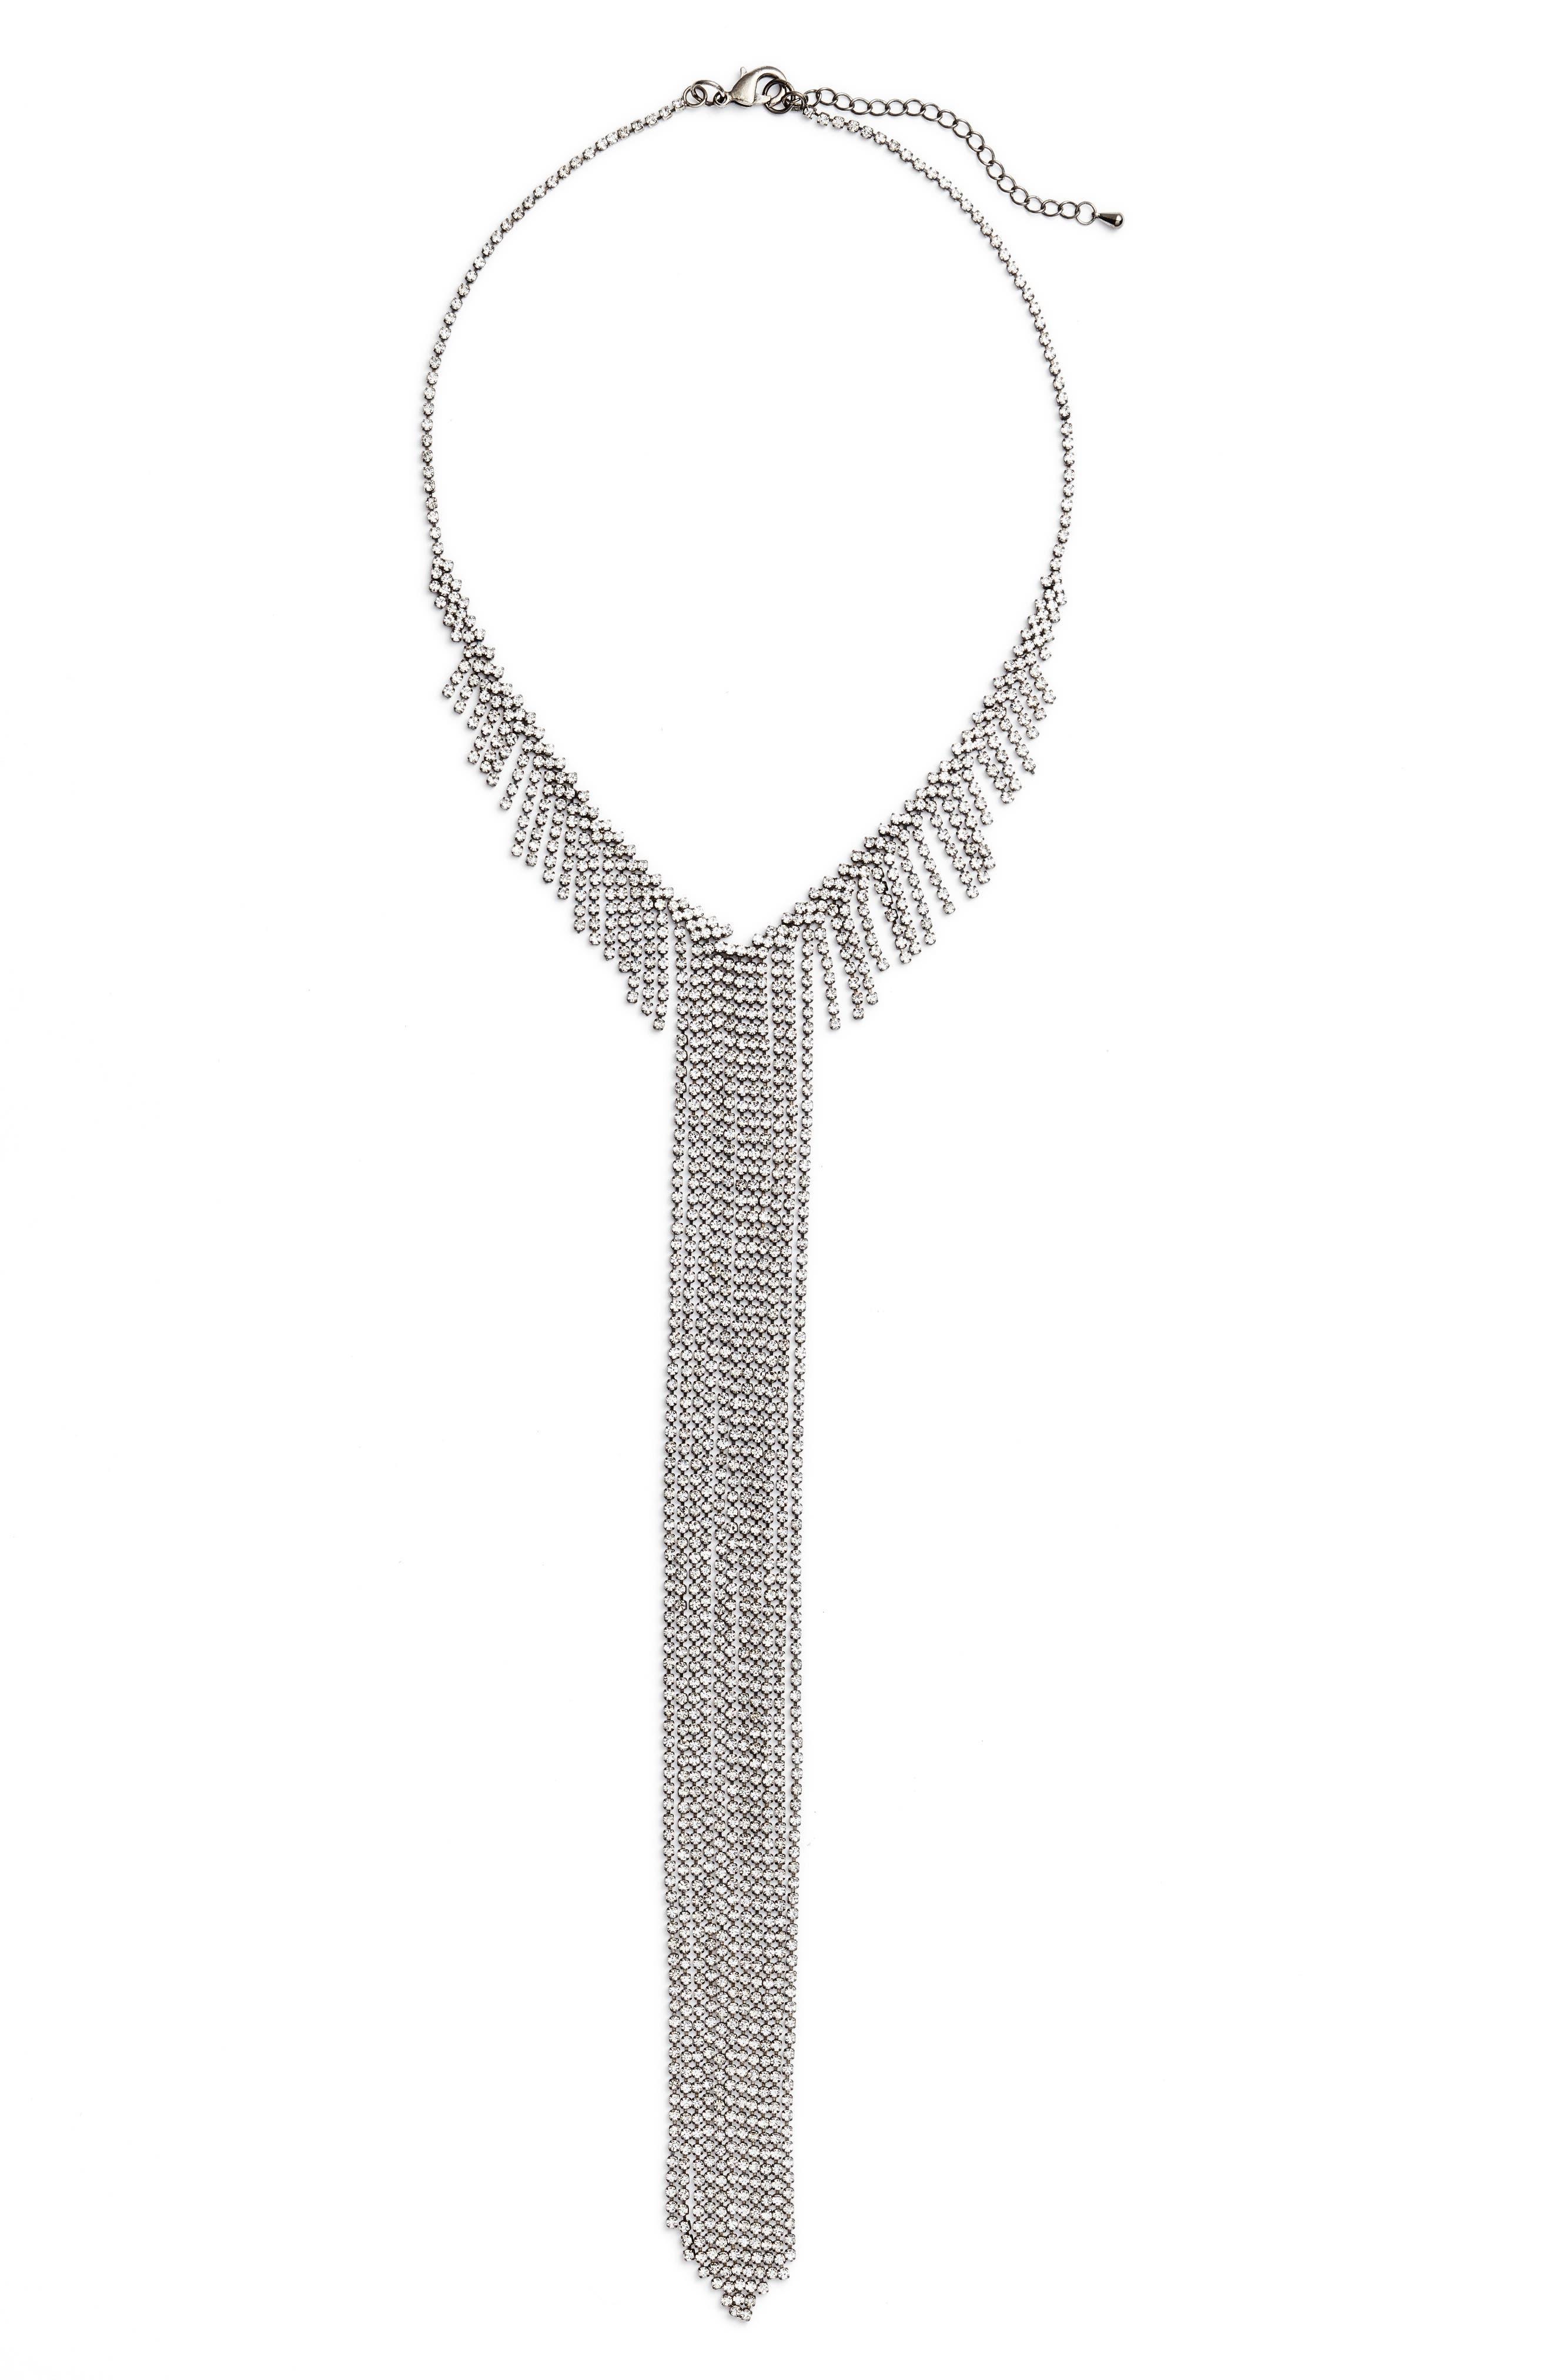 Alternate Image 1 Selected - CRISTABELLE Fringe Frontal Necklace